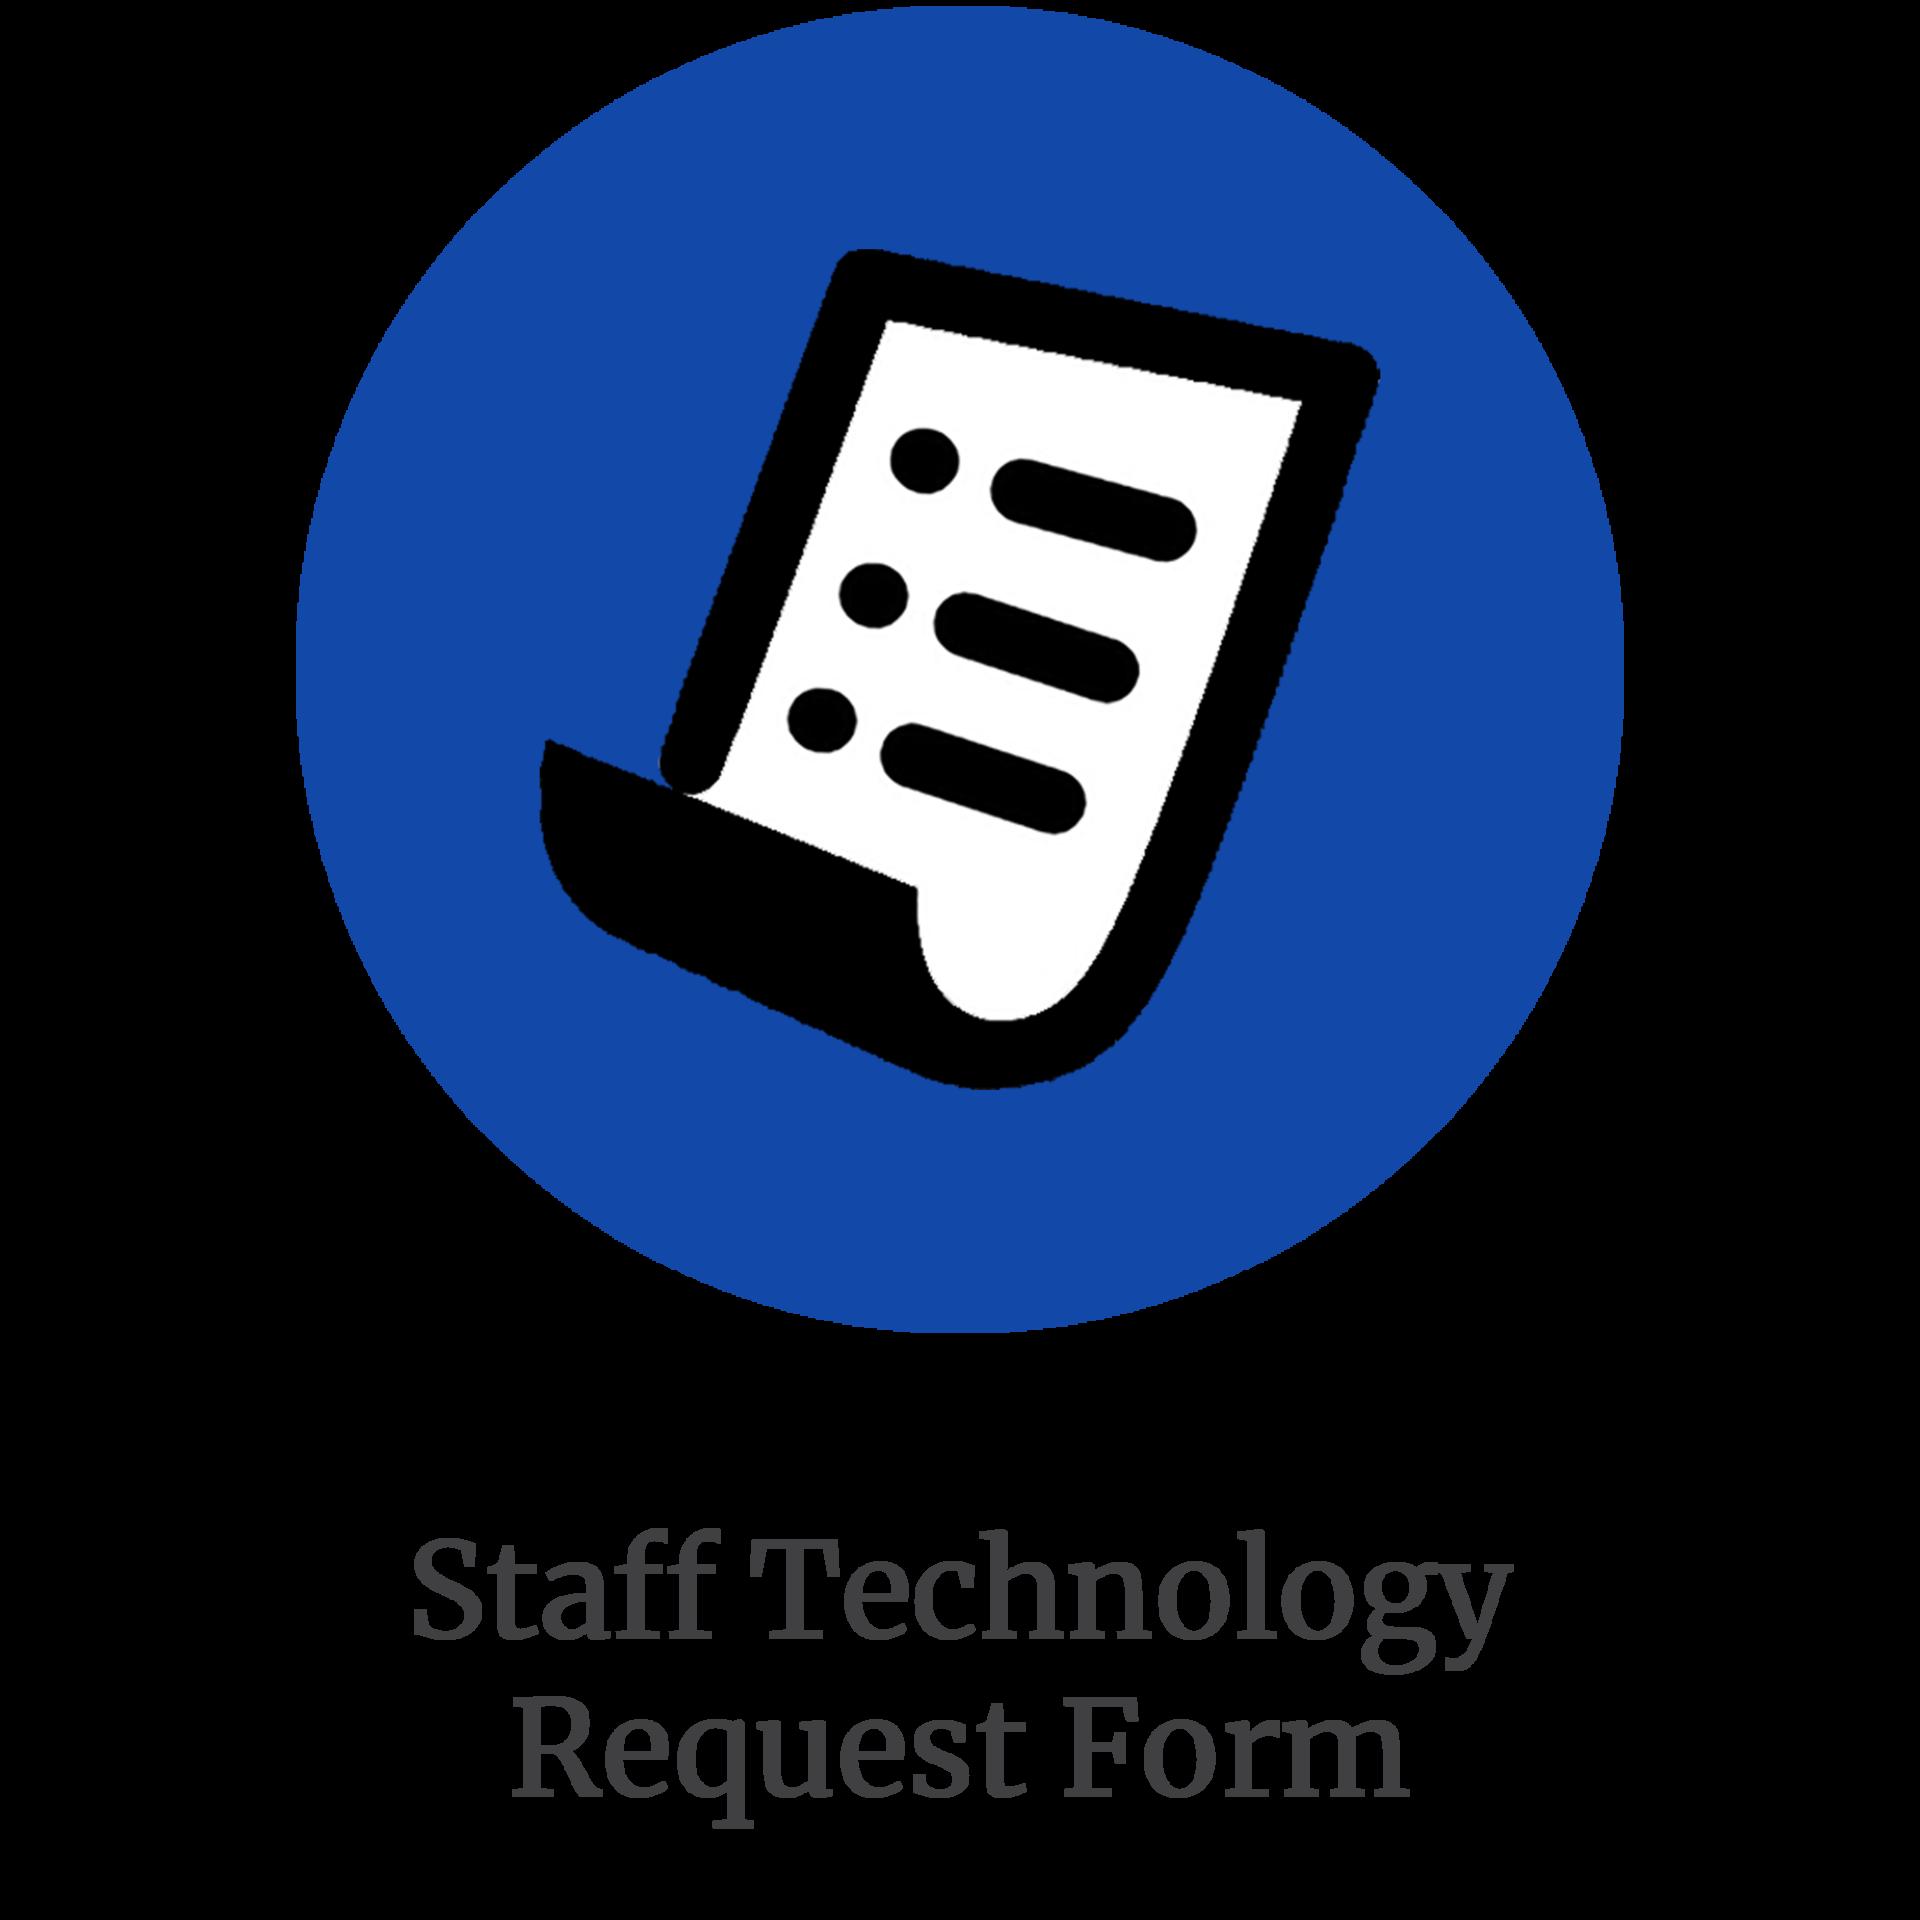 Staff Technology Request